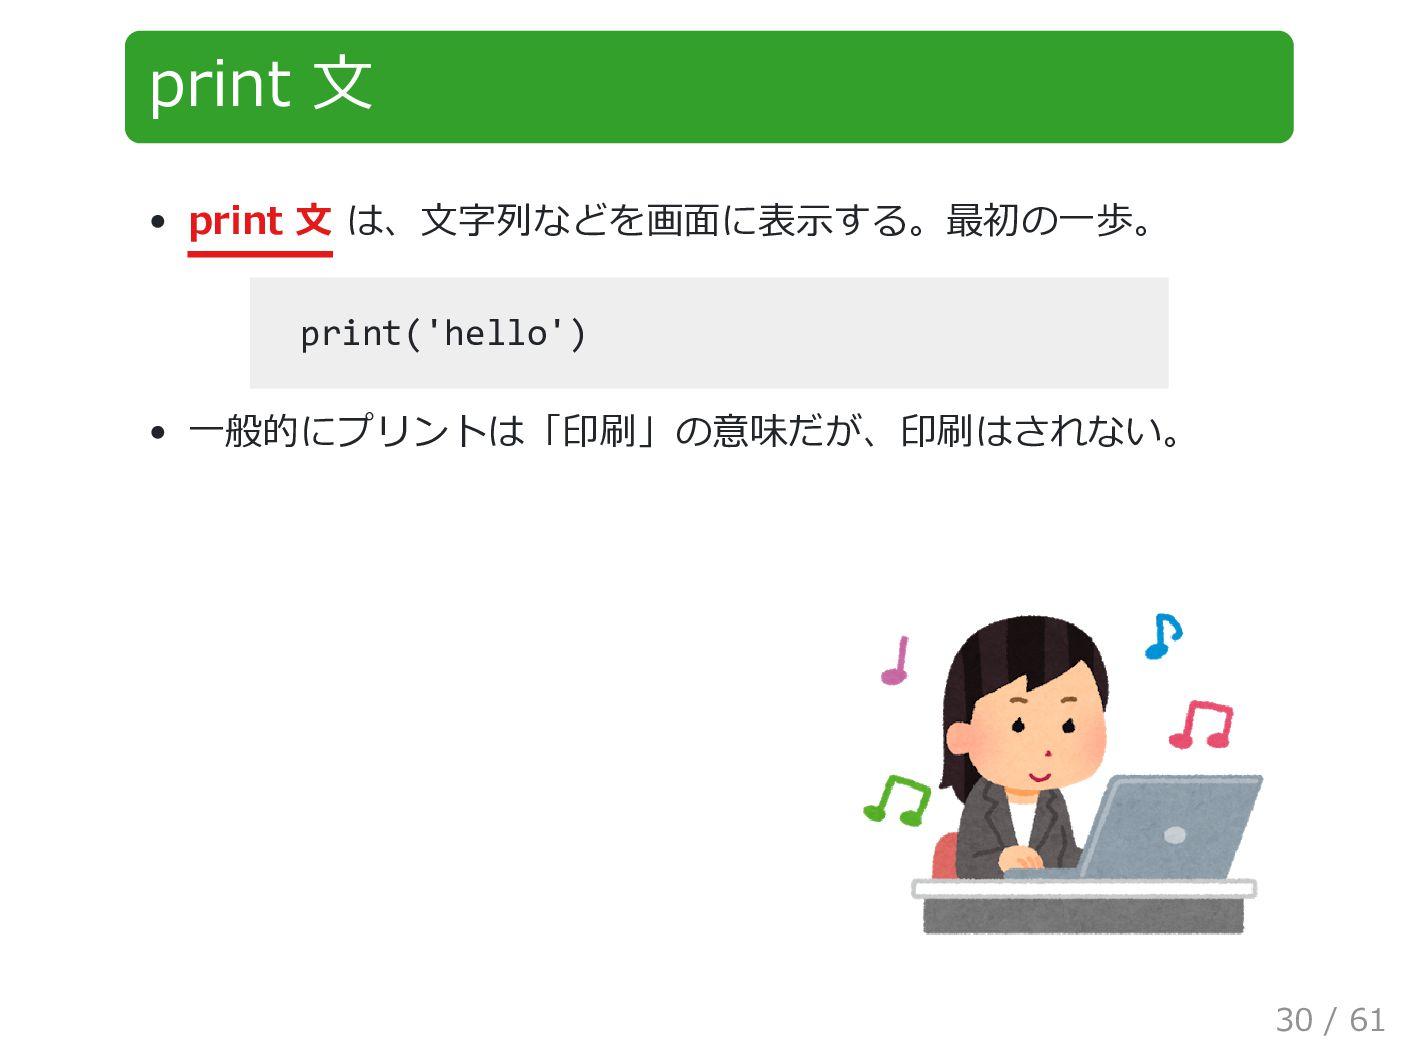 print ⽂ print ⽂ は、⽂字列などを画⾯に表⽰する。最初の⼀歩。 print('h...